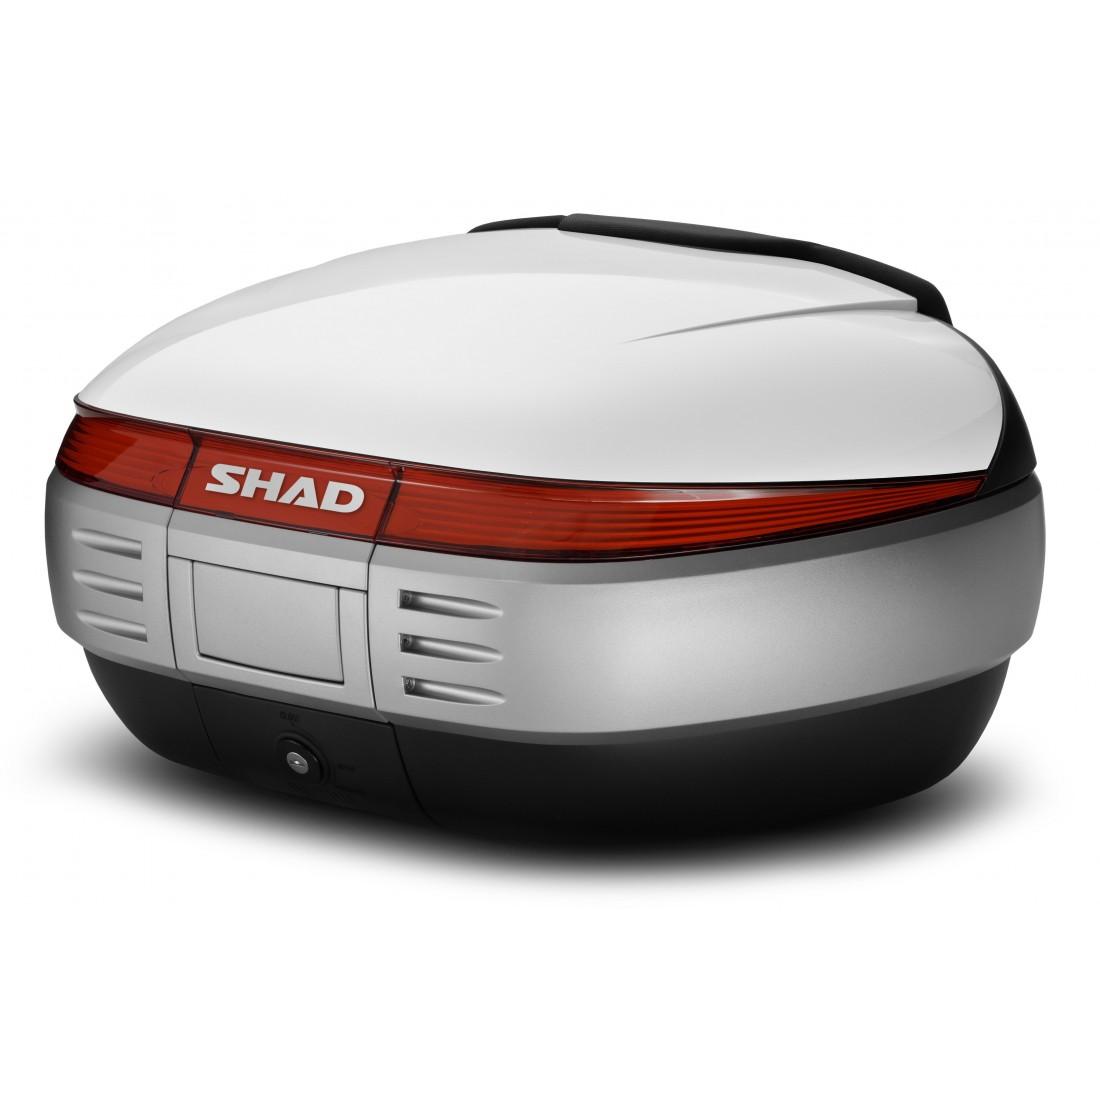 Tapa Baúl Shad SH50 50lt Blanco